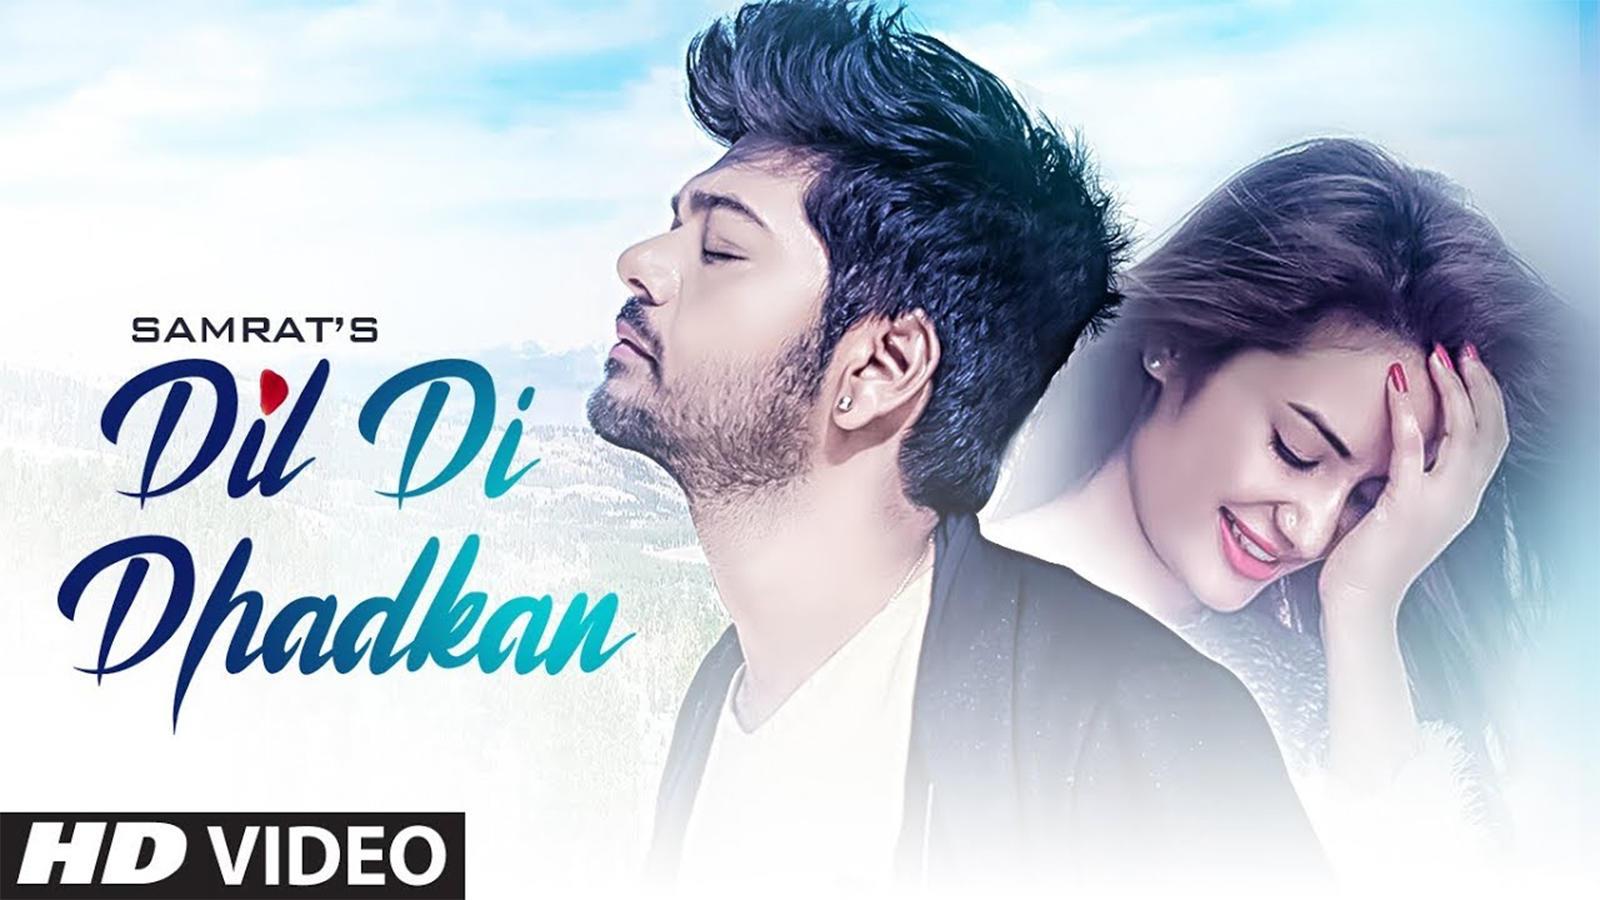 Latest Punjabi Song Dil Di Dhadkan Sung By Samrat | Punjabi Video Songs -  Times of India